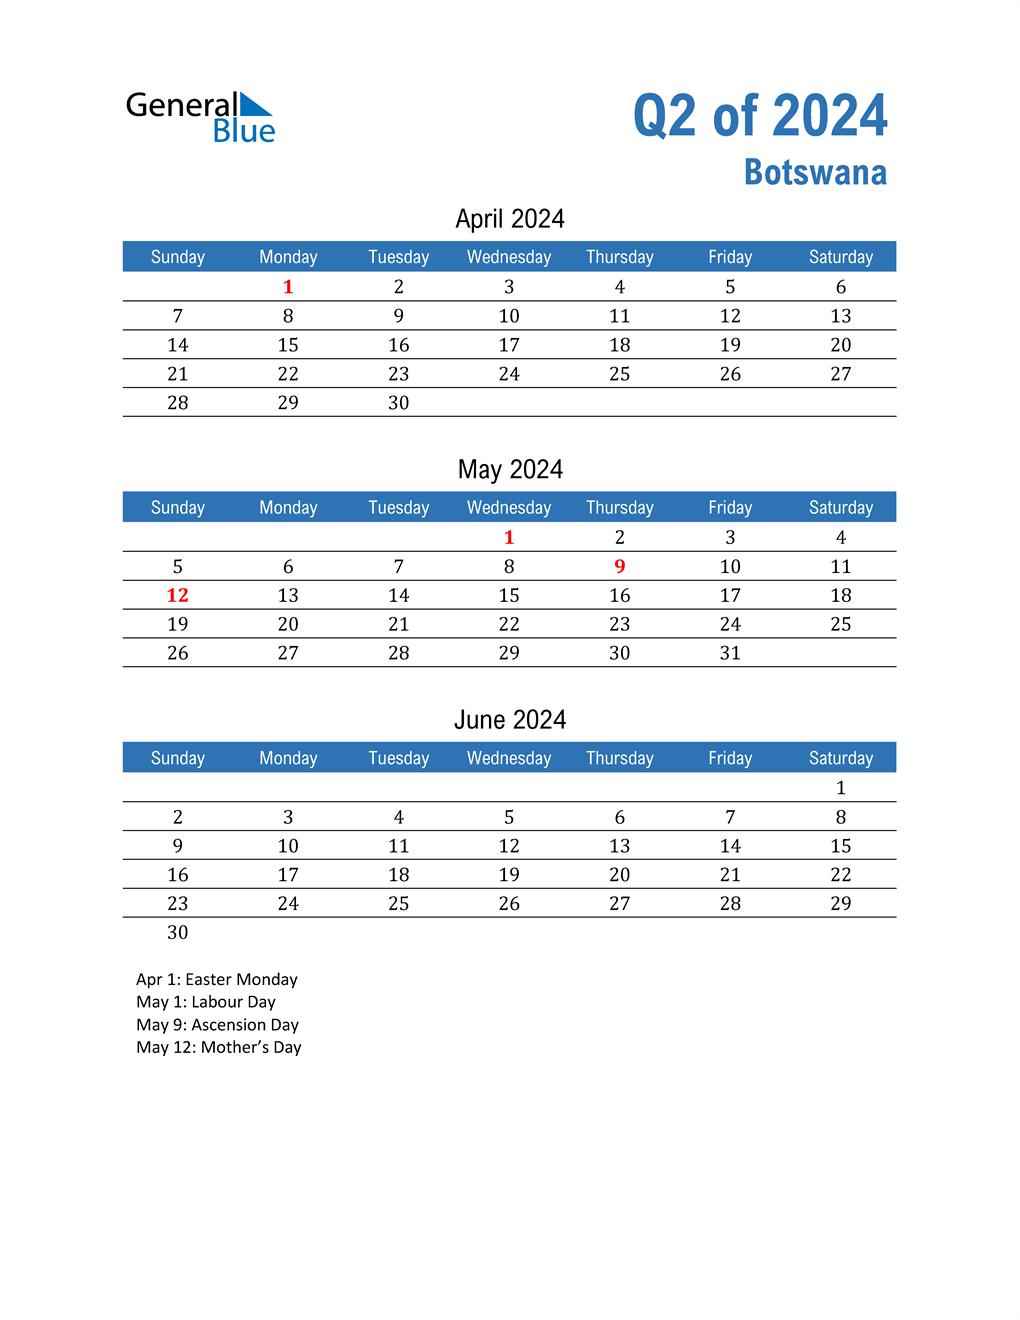 Botswana 2024 Quarterly Calendar